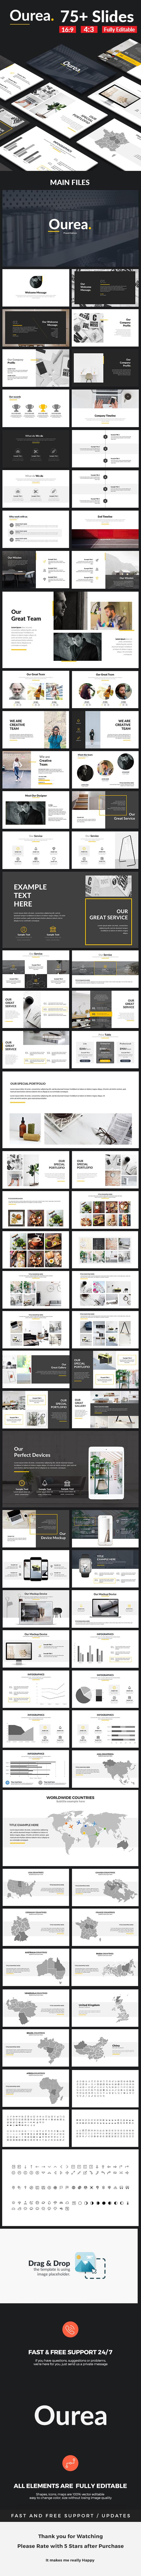 Ourea - Creative Keynote Template - Creative Keynote Templates